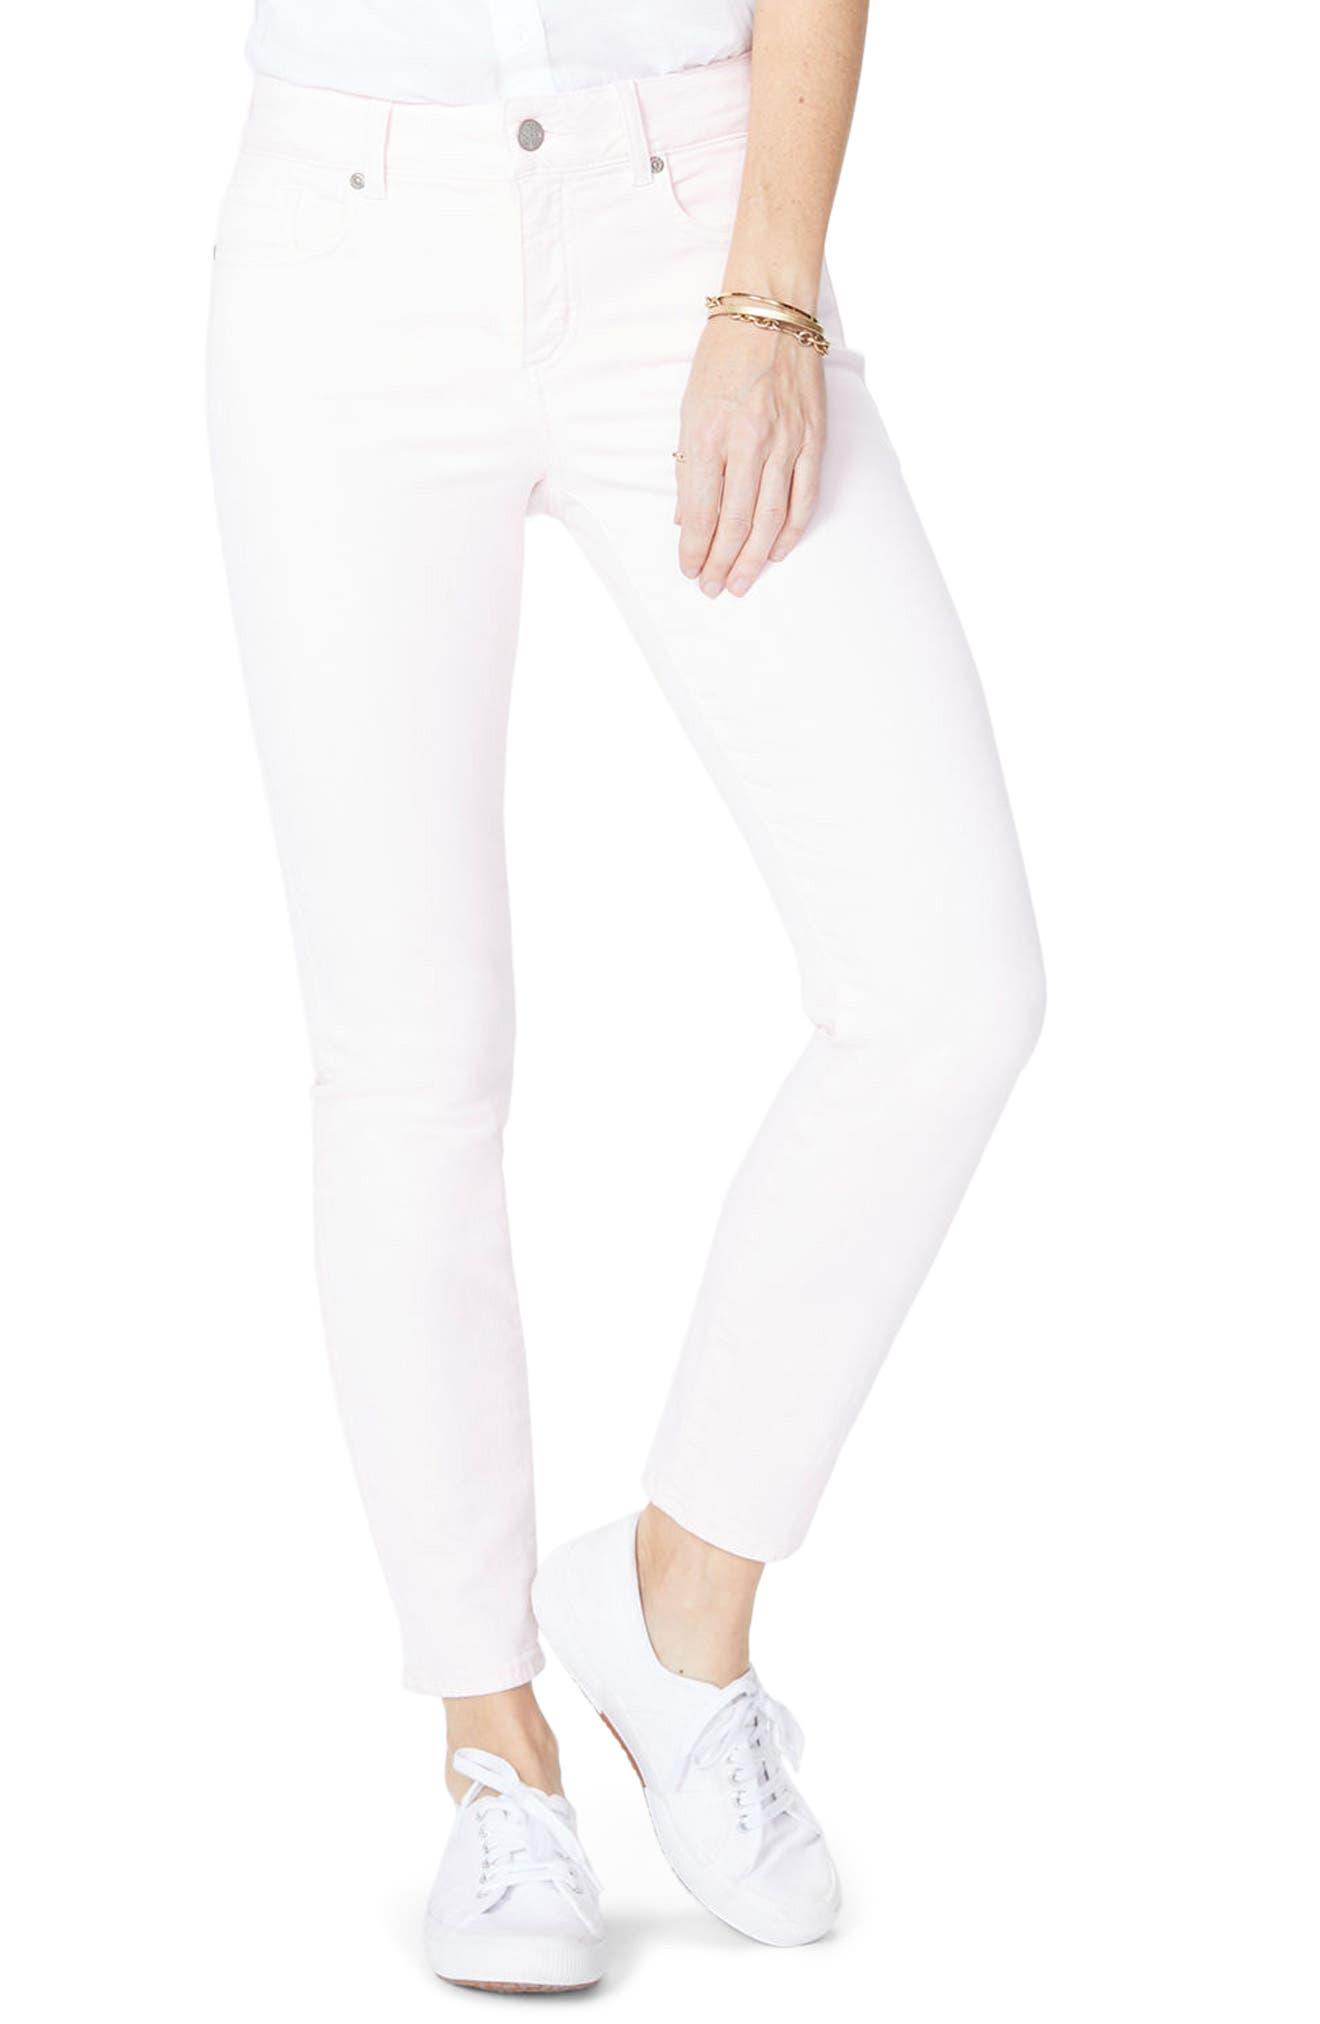 Alternate Image 1 Selected - NYDJ Alina Ankle Jeans (Light Primrose)